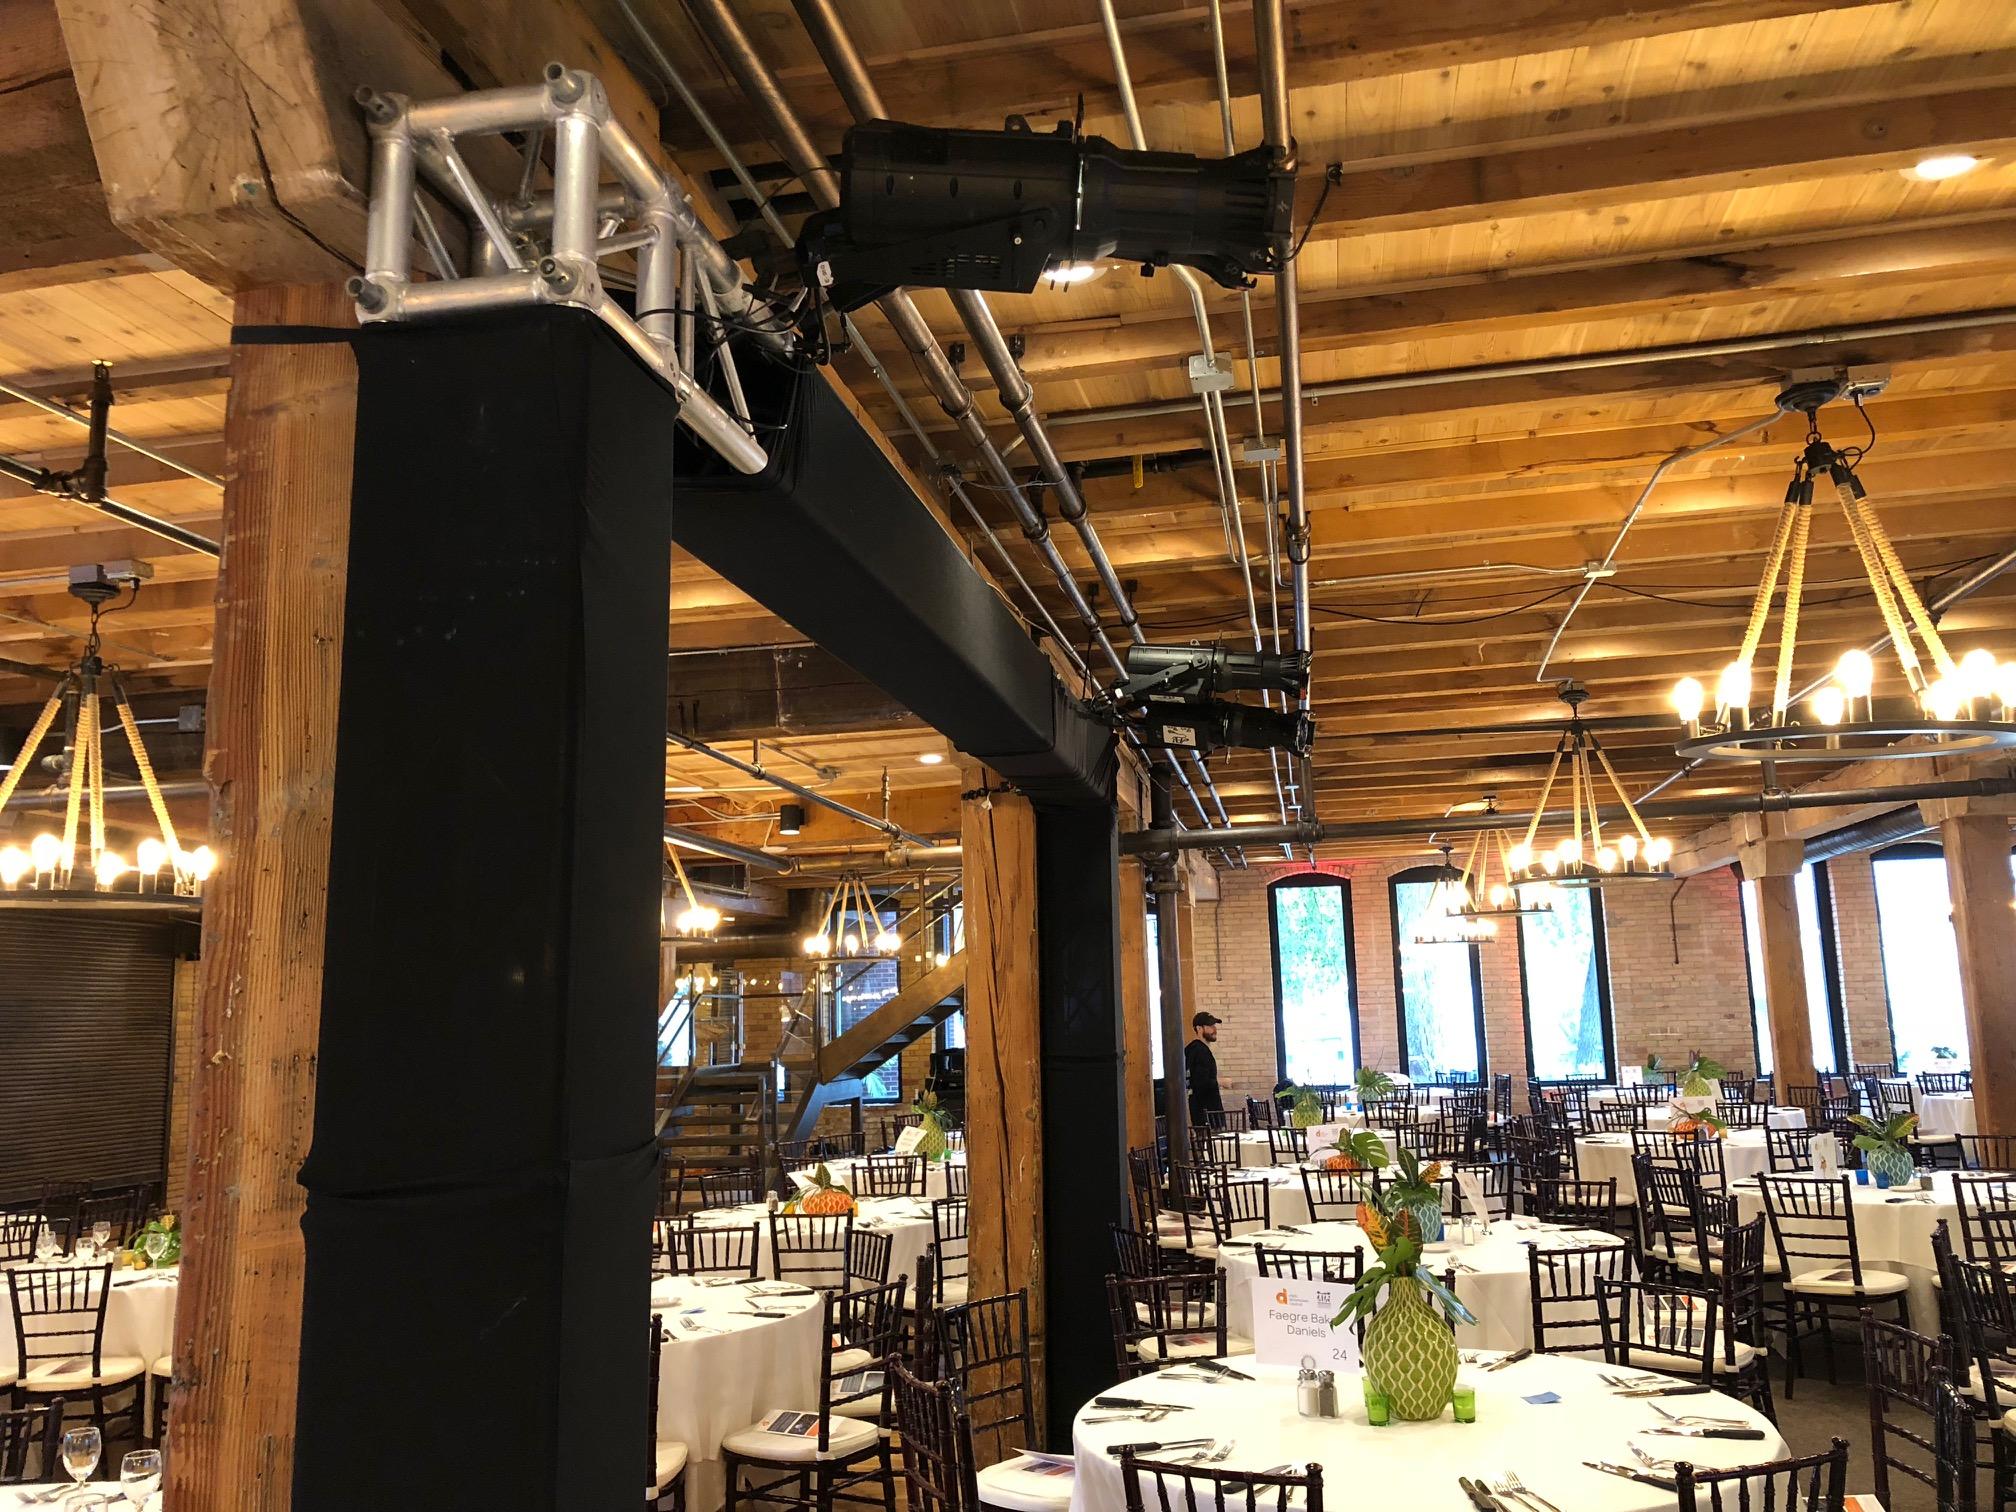 Picture of AV for You lighting rental equipment at the Minneapolis Event Center